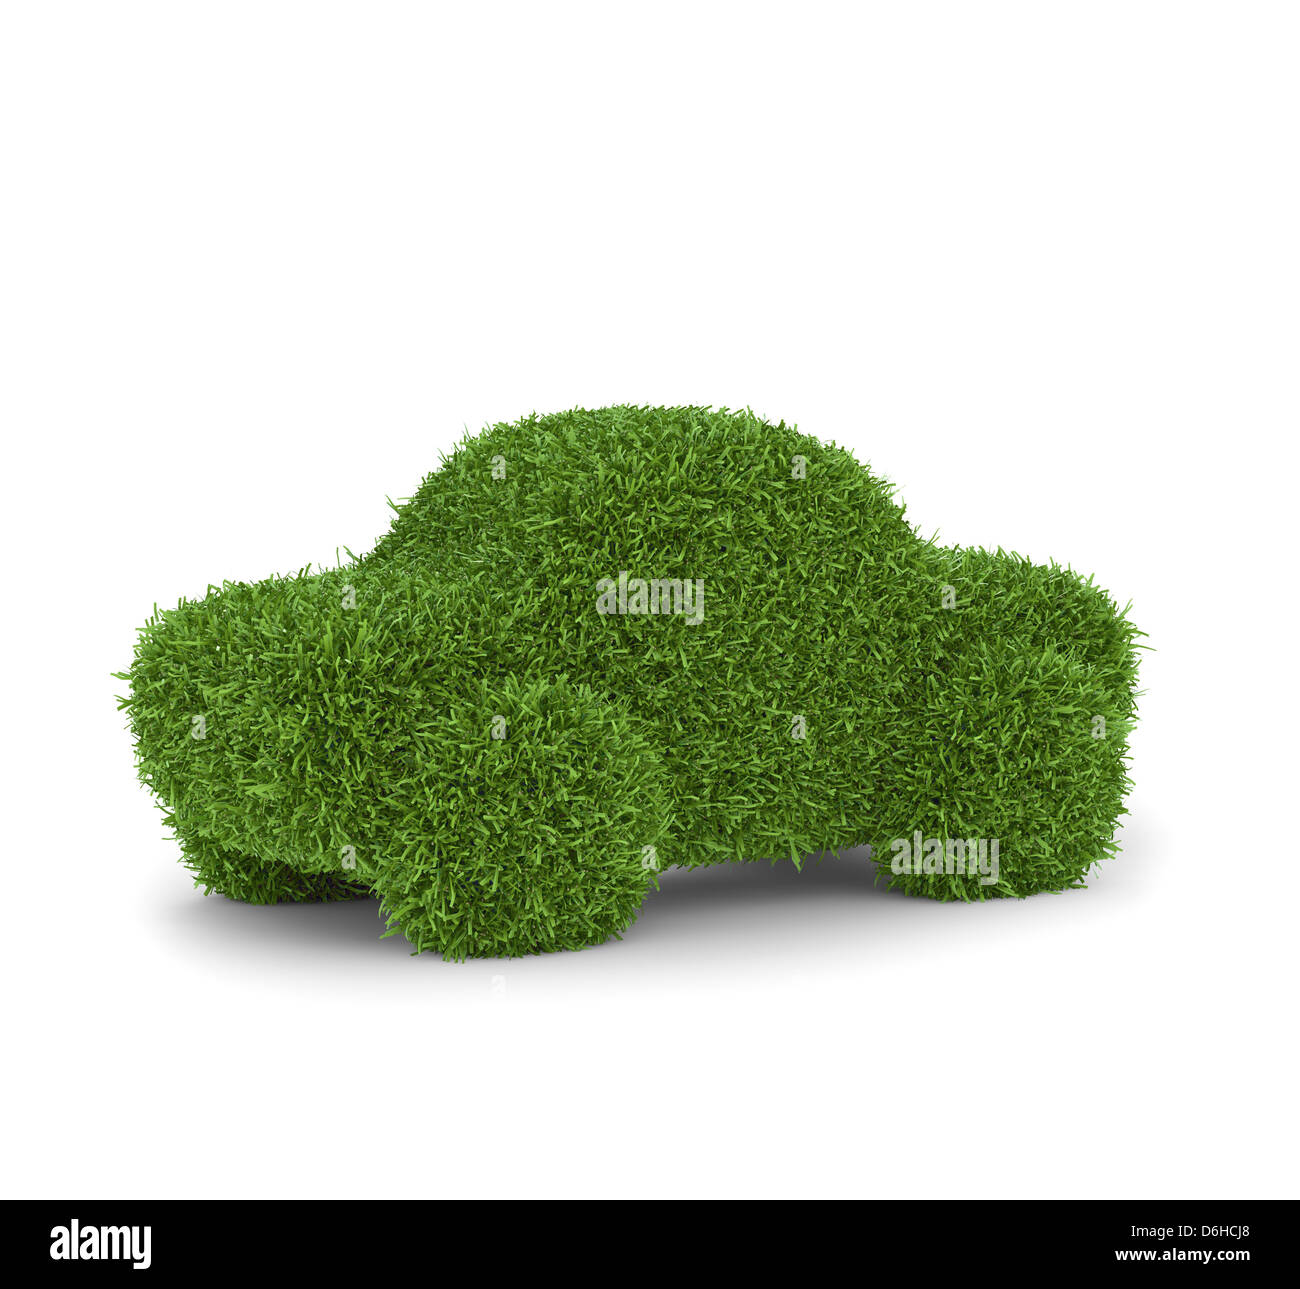 Grünes Auto, konzeptuellen Kunstwerk Stockbild